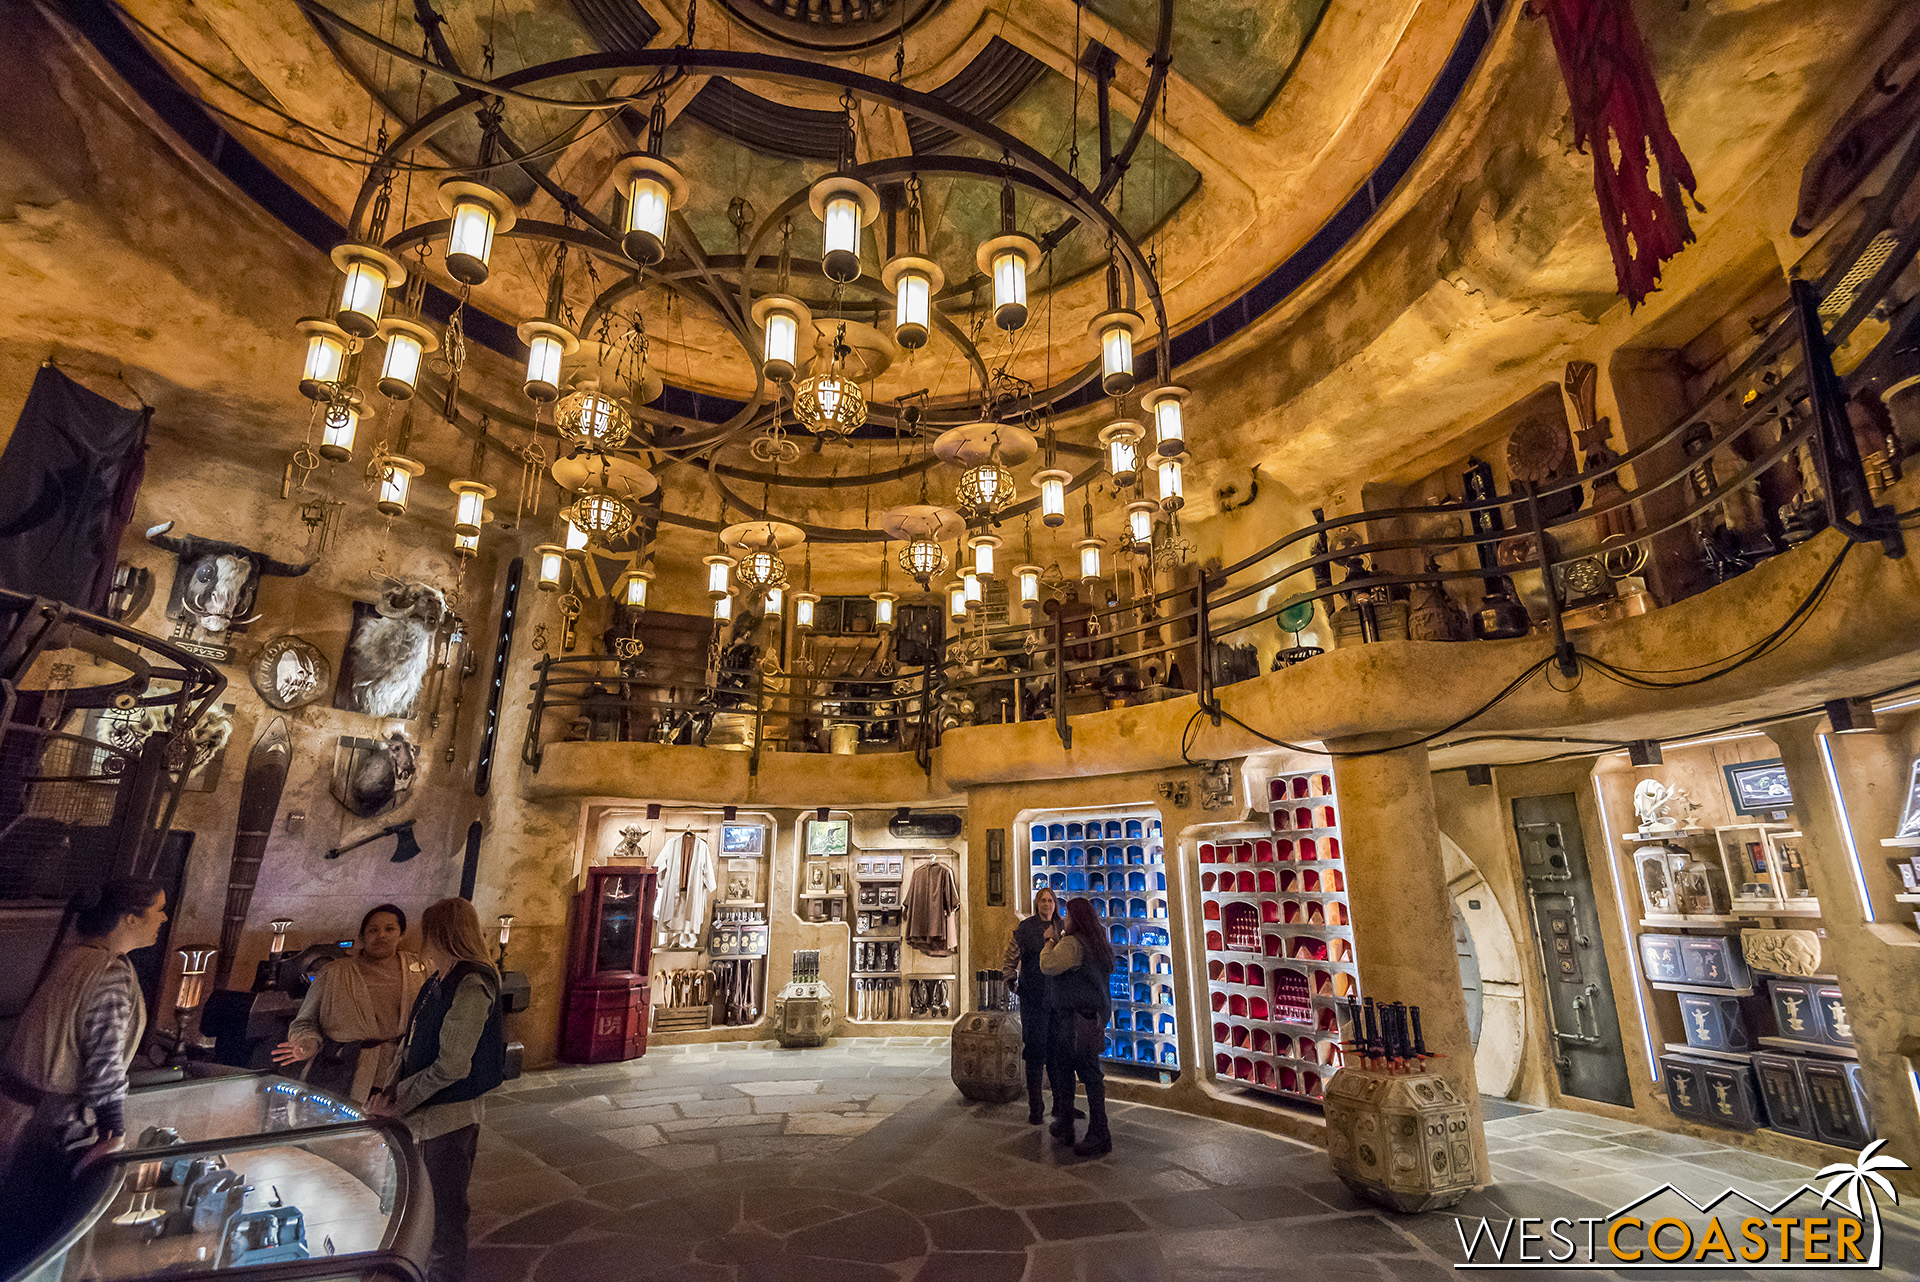 A look inside the lavish shop.